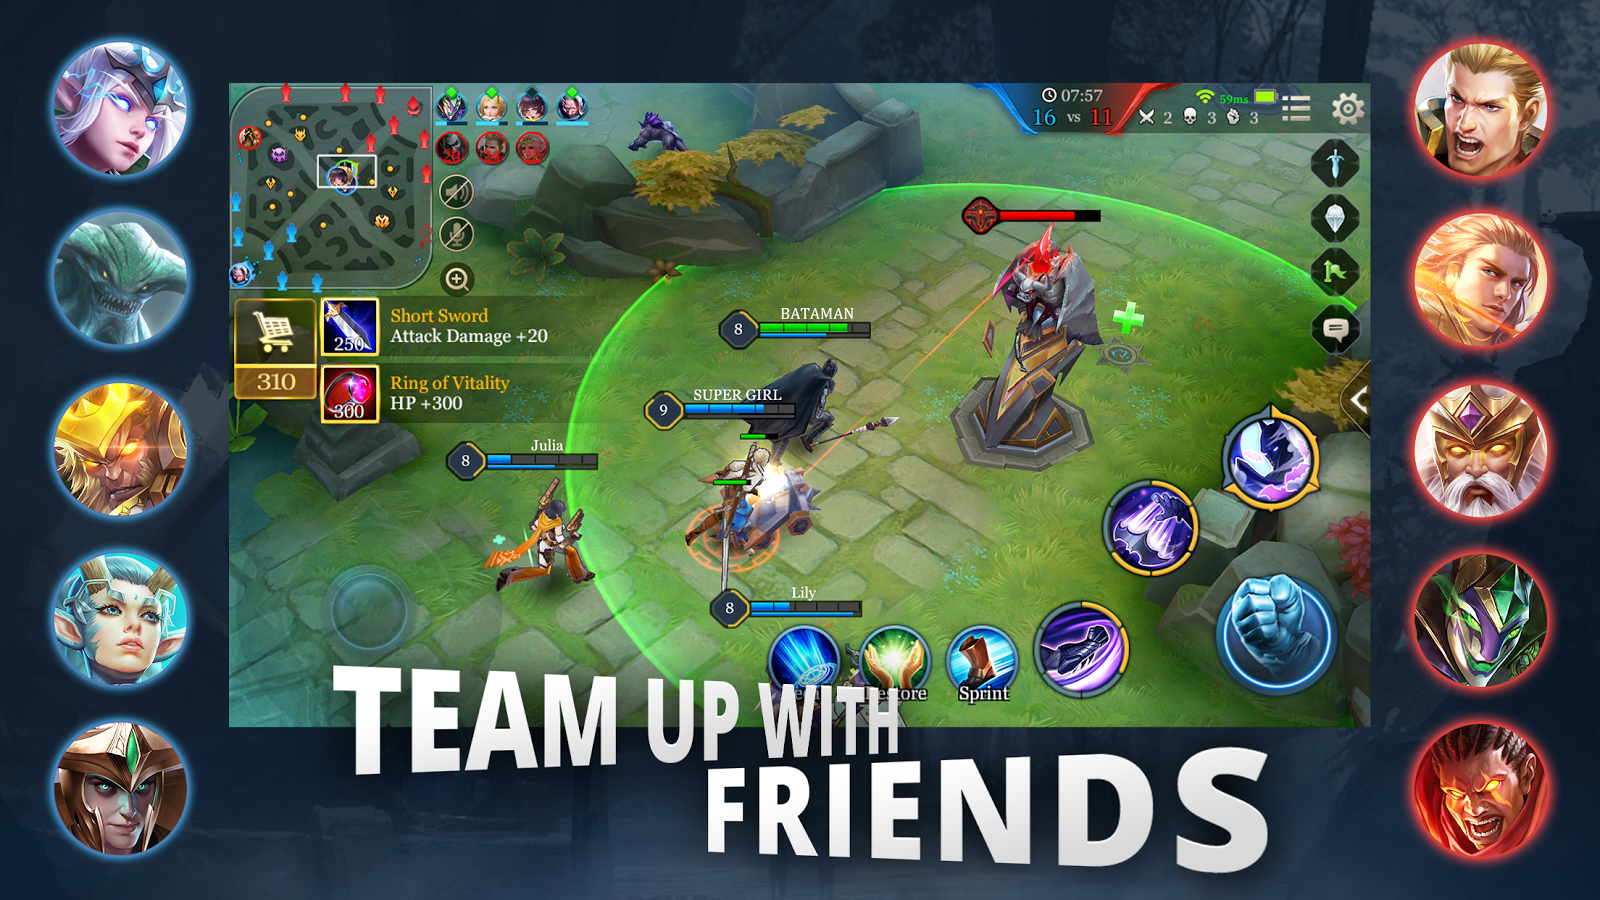 Arena of Valor: 5v5 Arena Game – zrzut ekranu